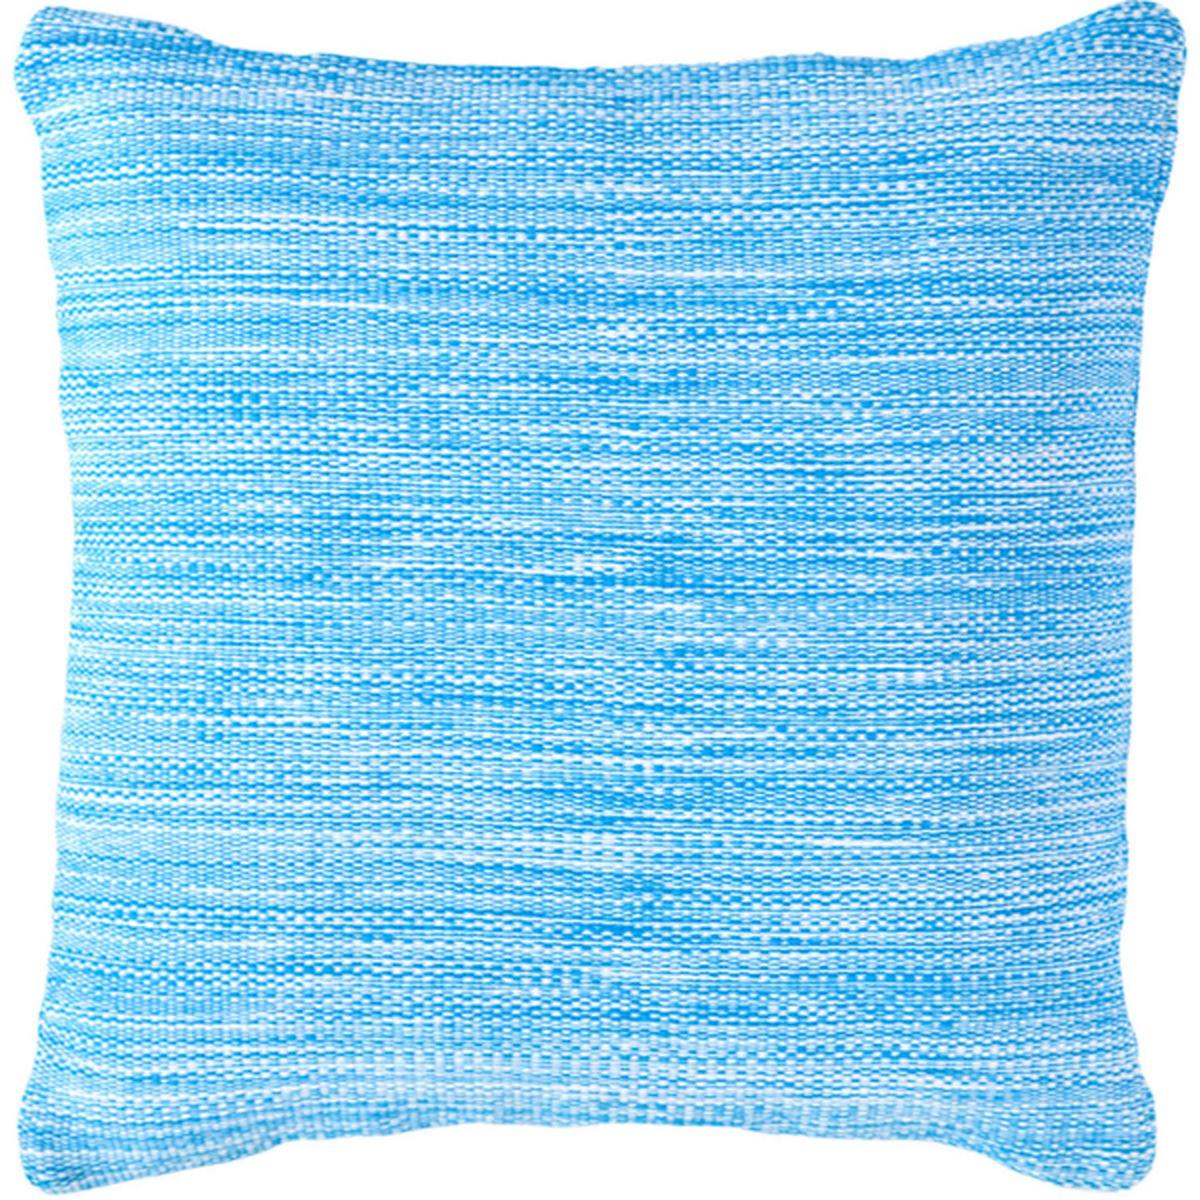 Mingled Turquoise Indoor/Outdoor Pillow